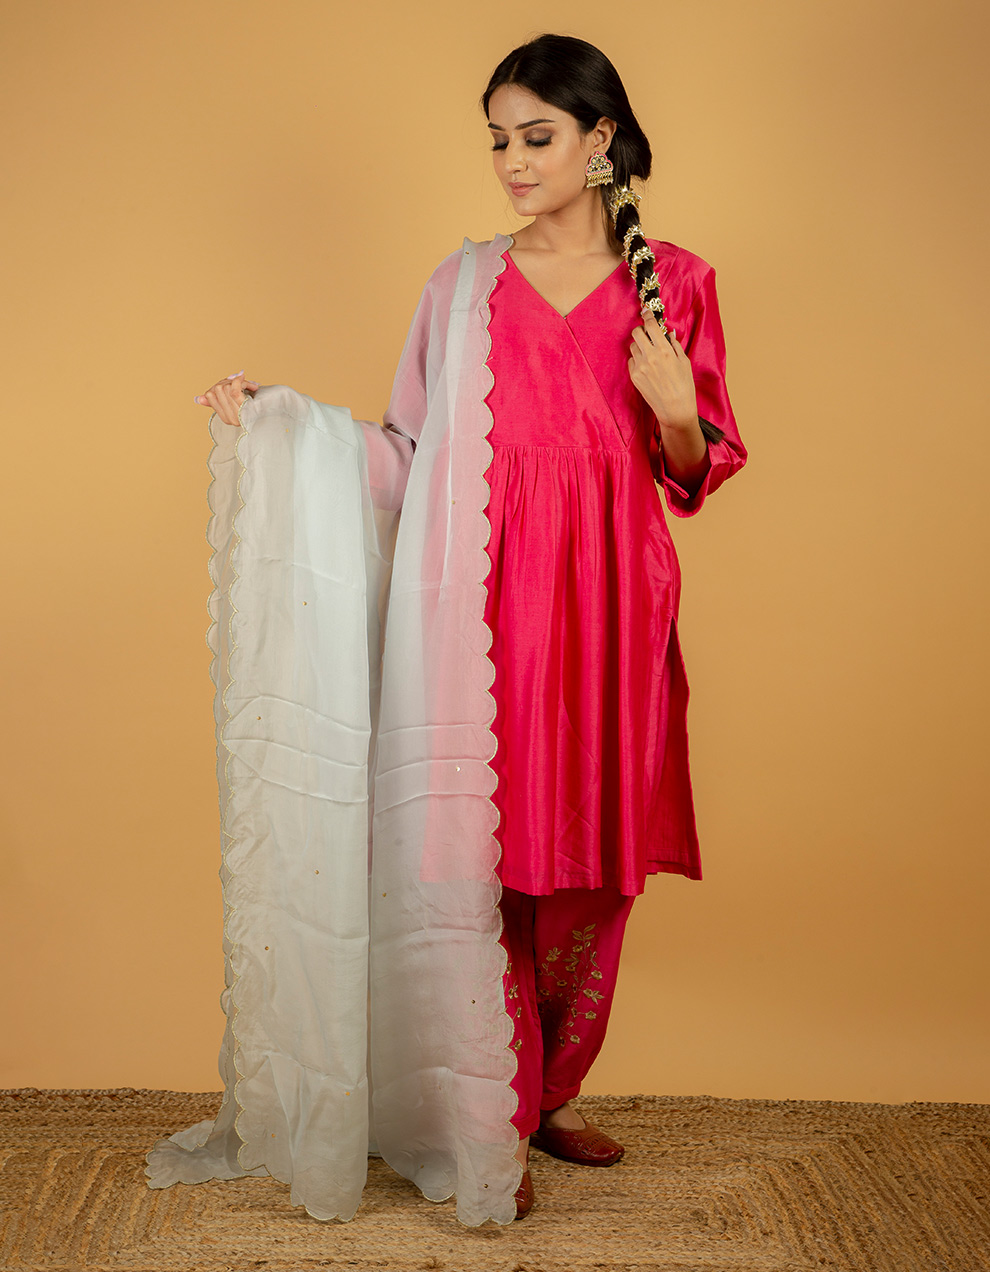 affordable organza dupatta for sale in India. Powder blue color organza dupatta designs for ladies.